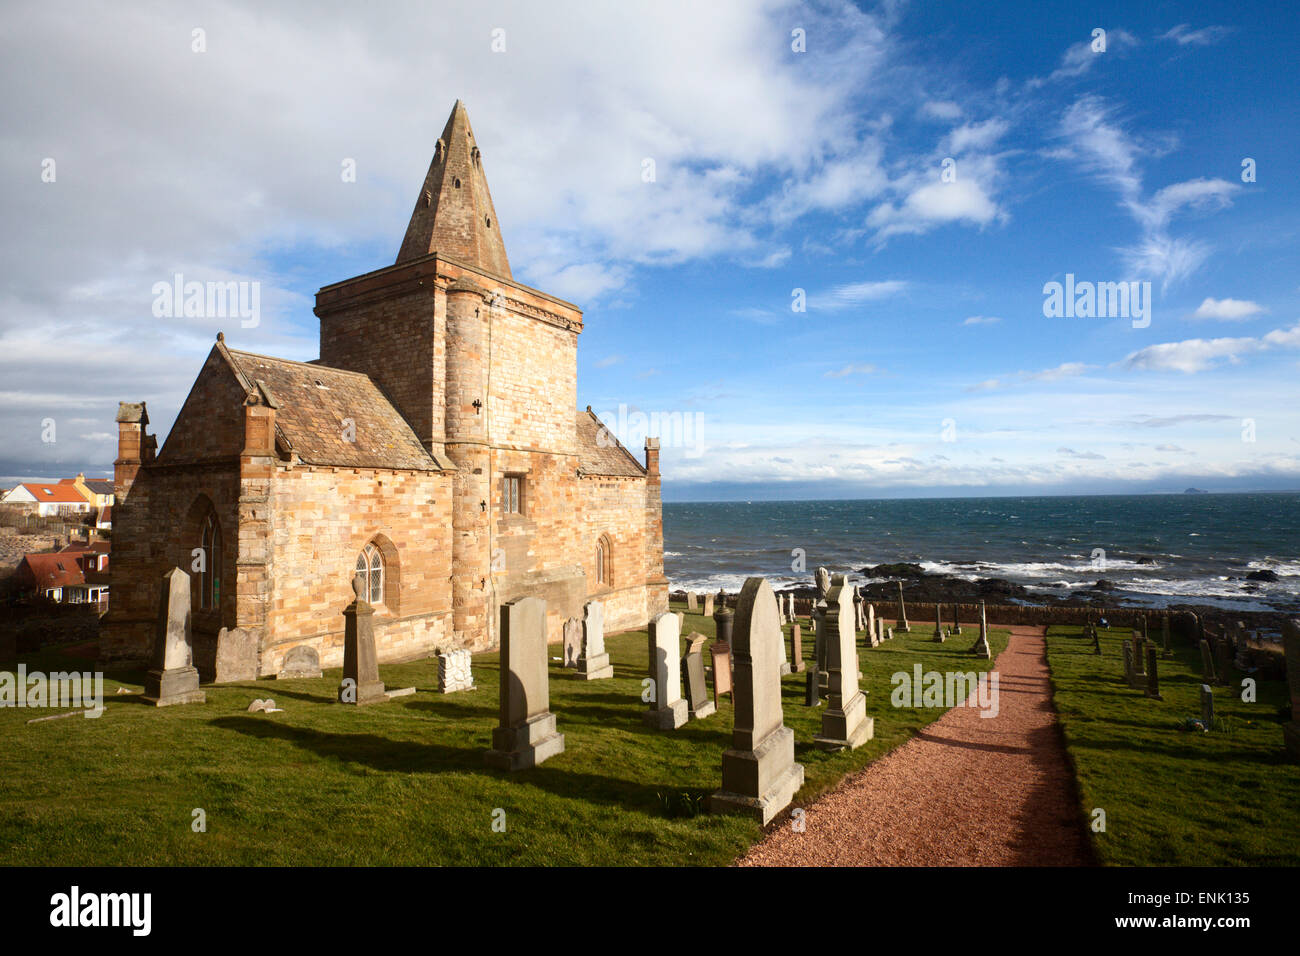 The Auld Kirk and Kirkyard on the Fife Coast at St. Monans, Fife, Scotland, United Kingdom, Europe - Stock Image